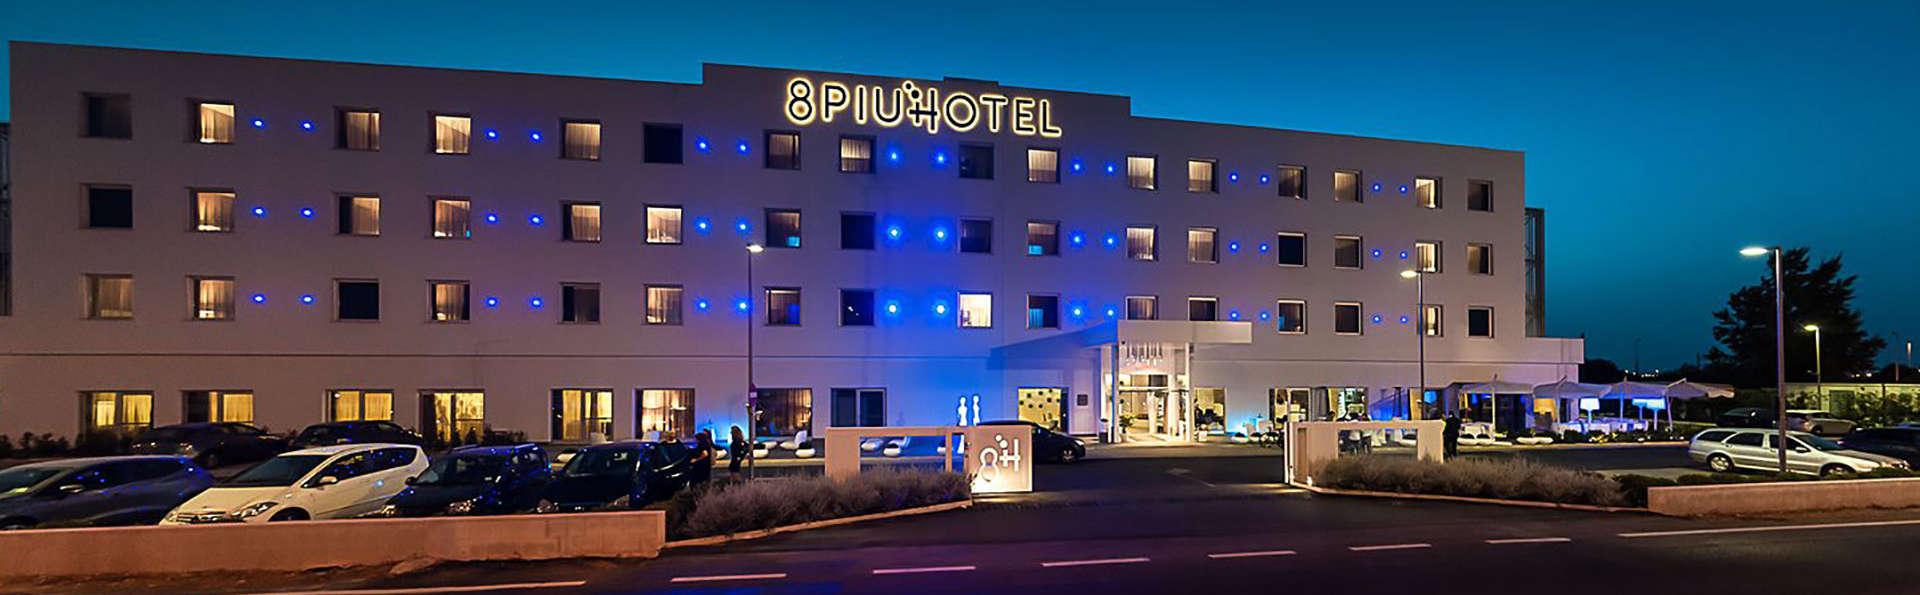 8Piu Hotel - Edit_Front.jpg